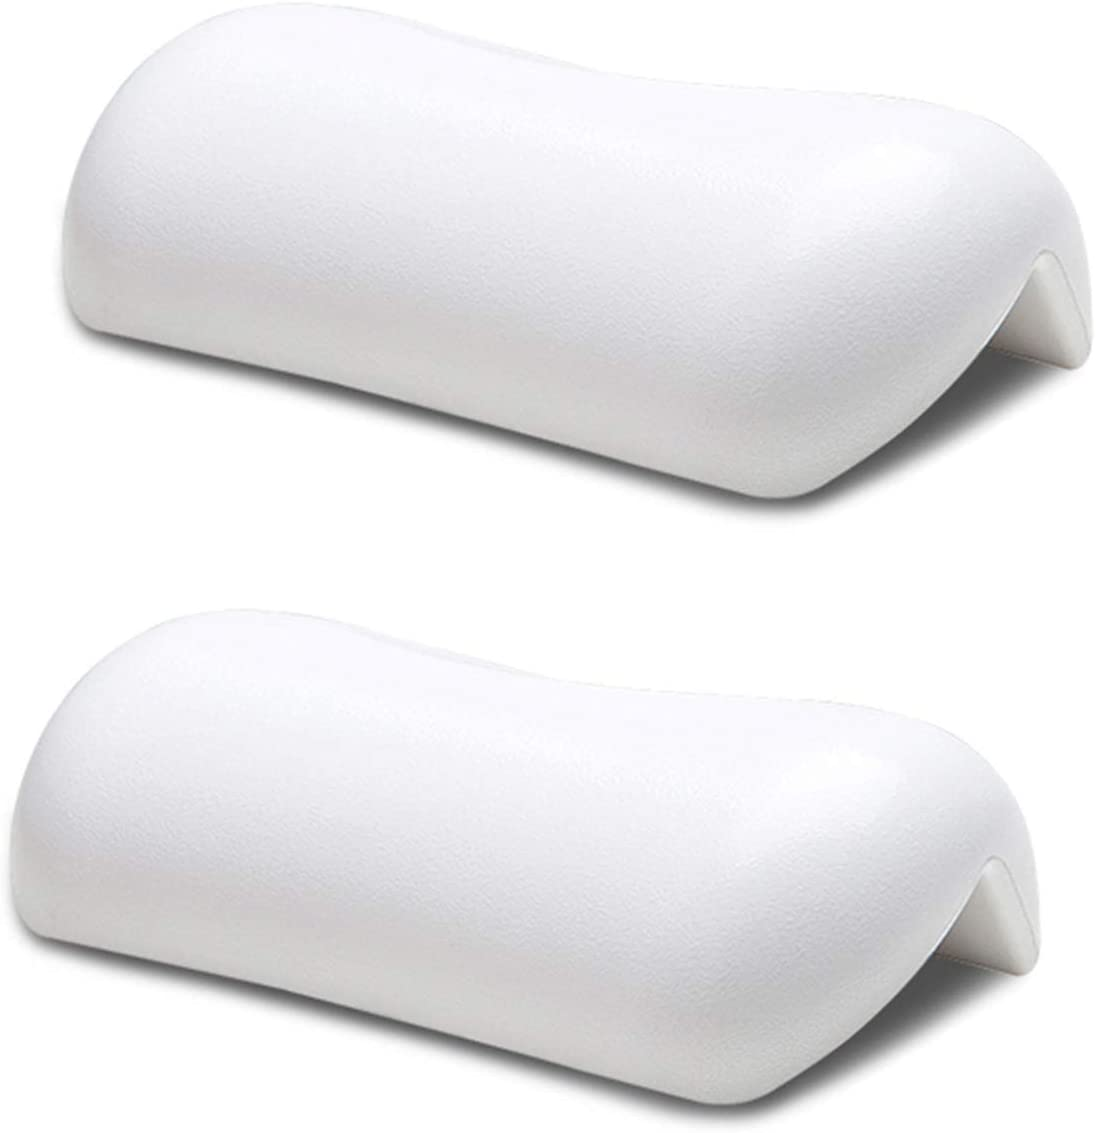 XIZHOUCUN Bath Pillow Non-Slip Bathtub Soft Cheap super New color special price Waterproof Headrest